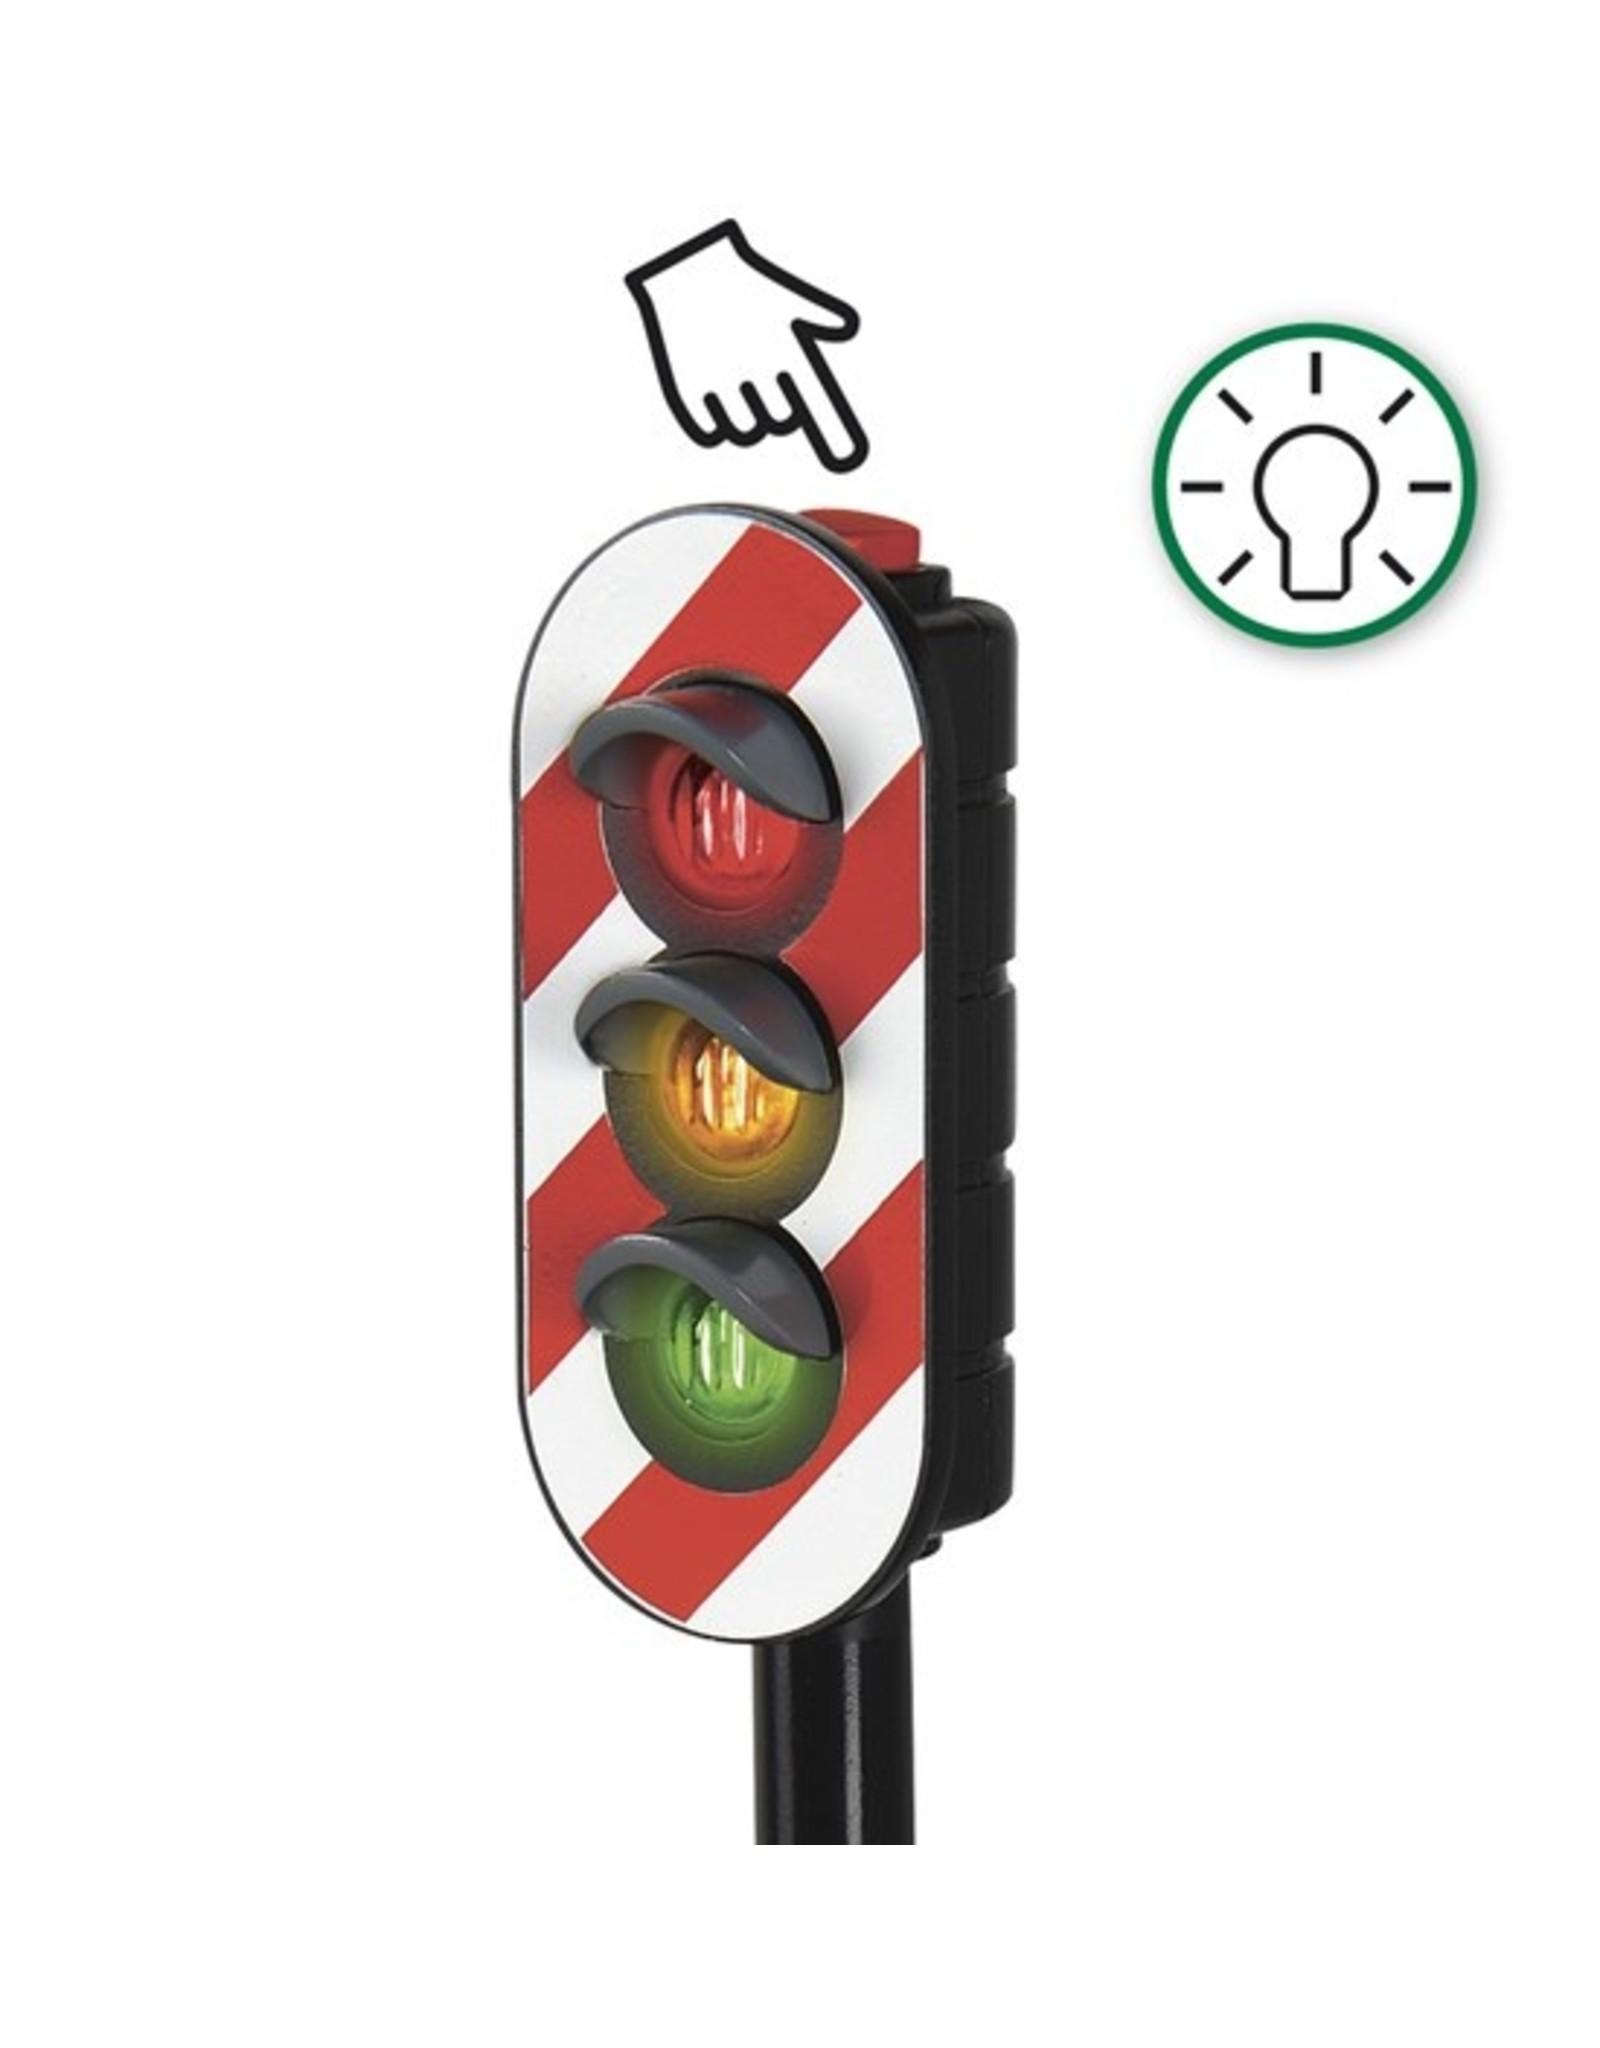 Brio Light Signal for Railway